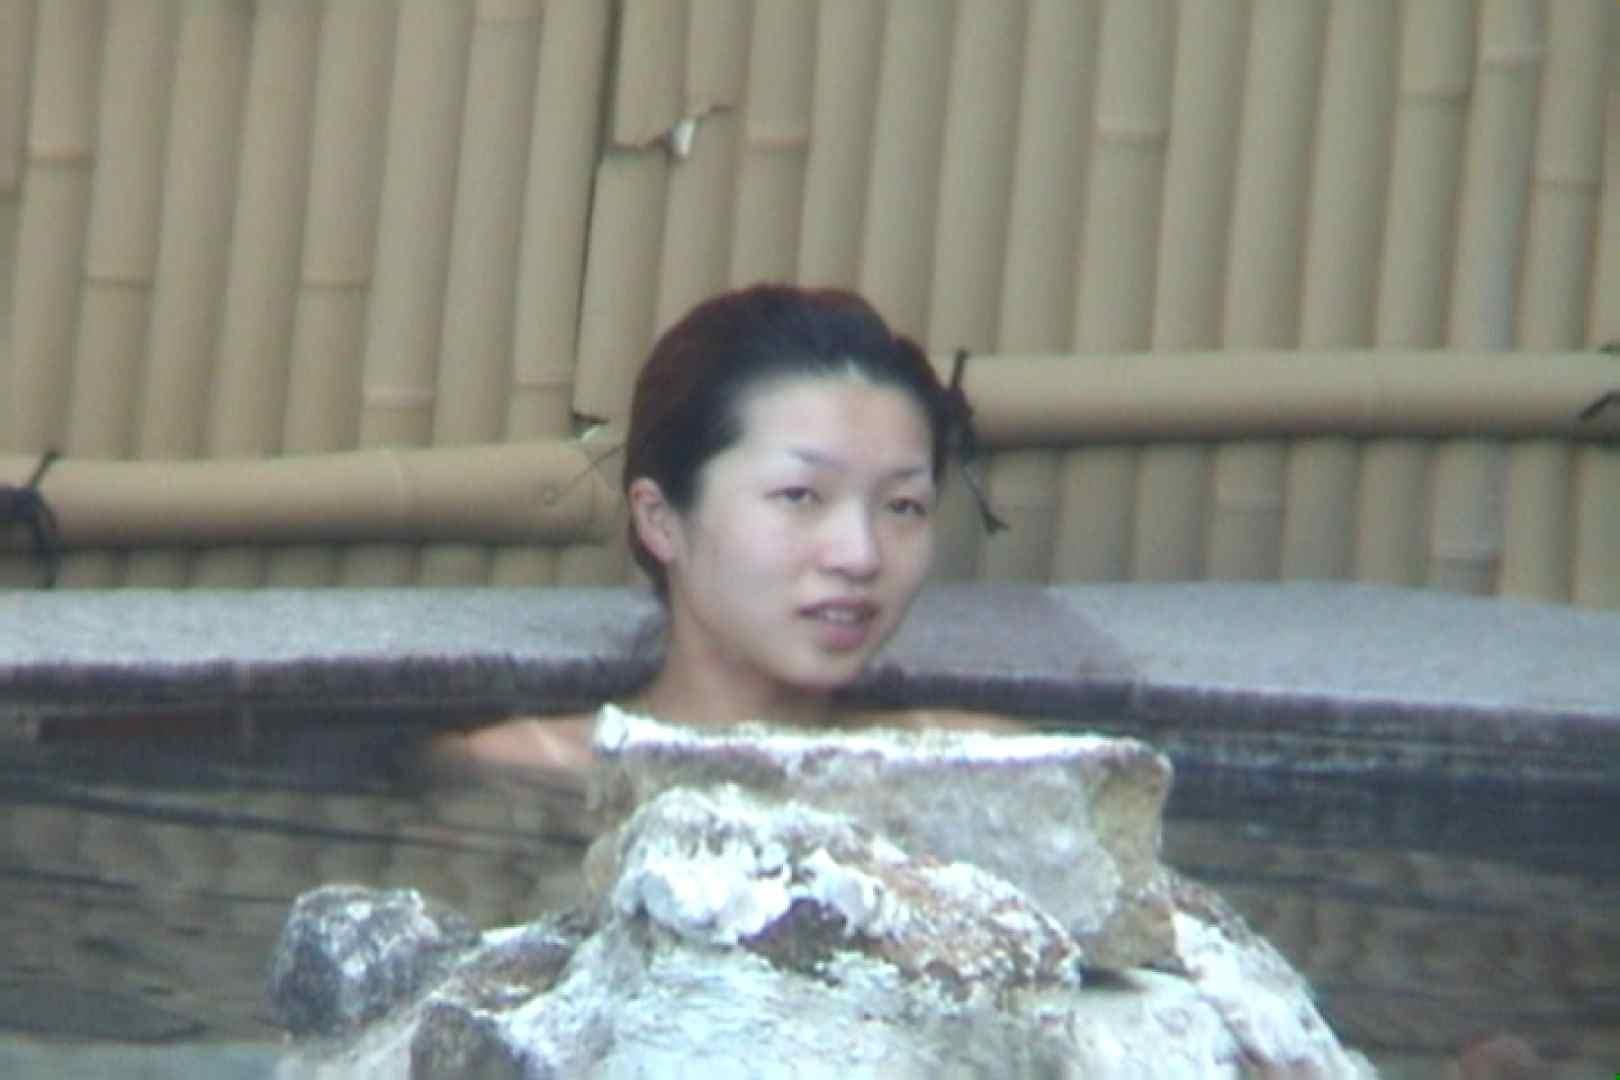 Aquaな露天風呂Vol.571 盗撮映像  35Pix 1